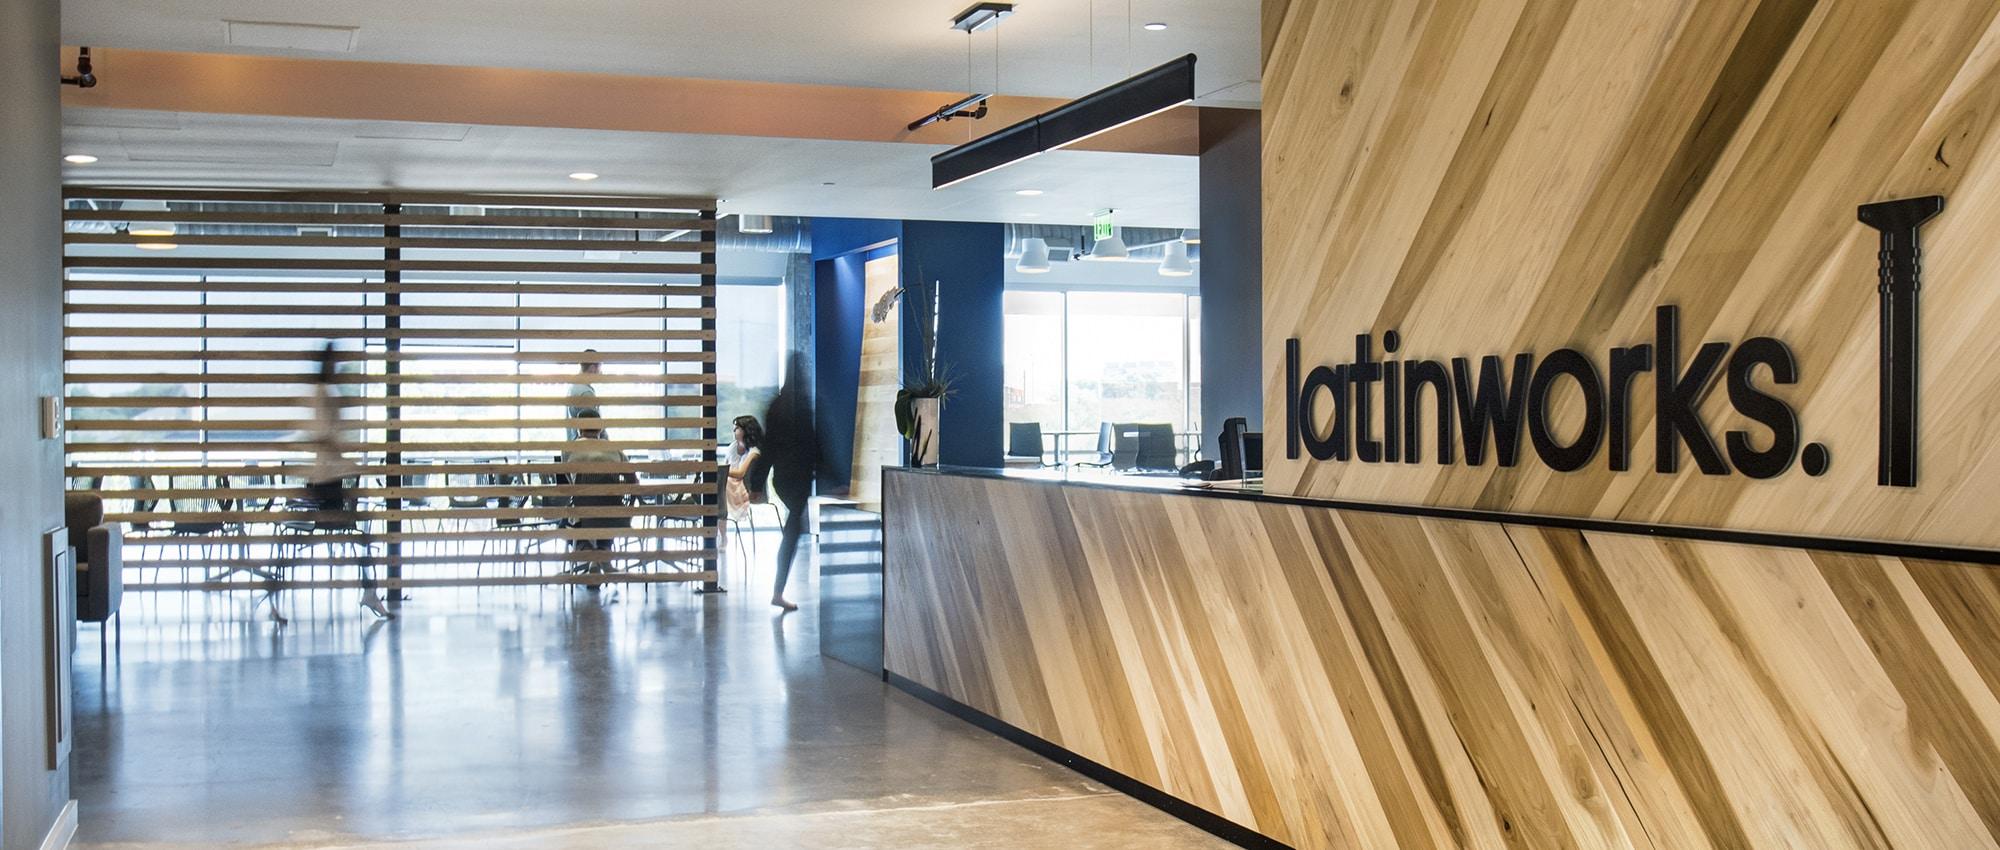 LatinWorks Headquarters | Modern Office in Austin, Texas